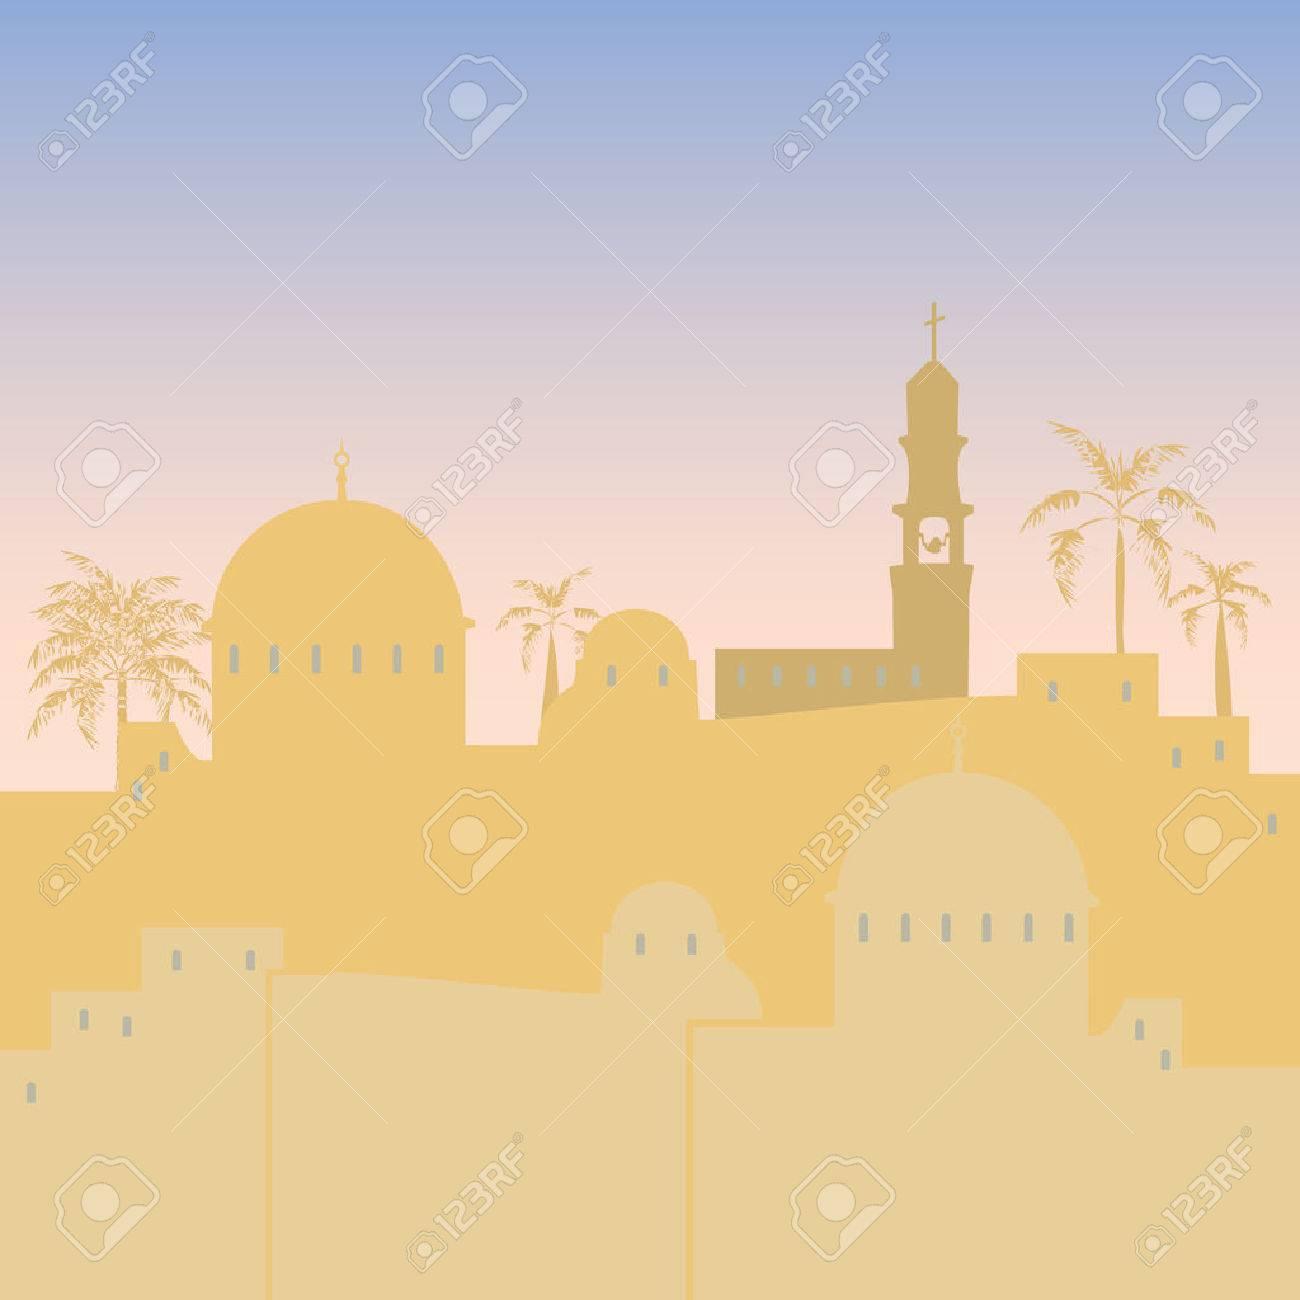 Jerusalem Israel skyline silhouette flat design illustration - 59853120